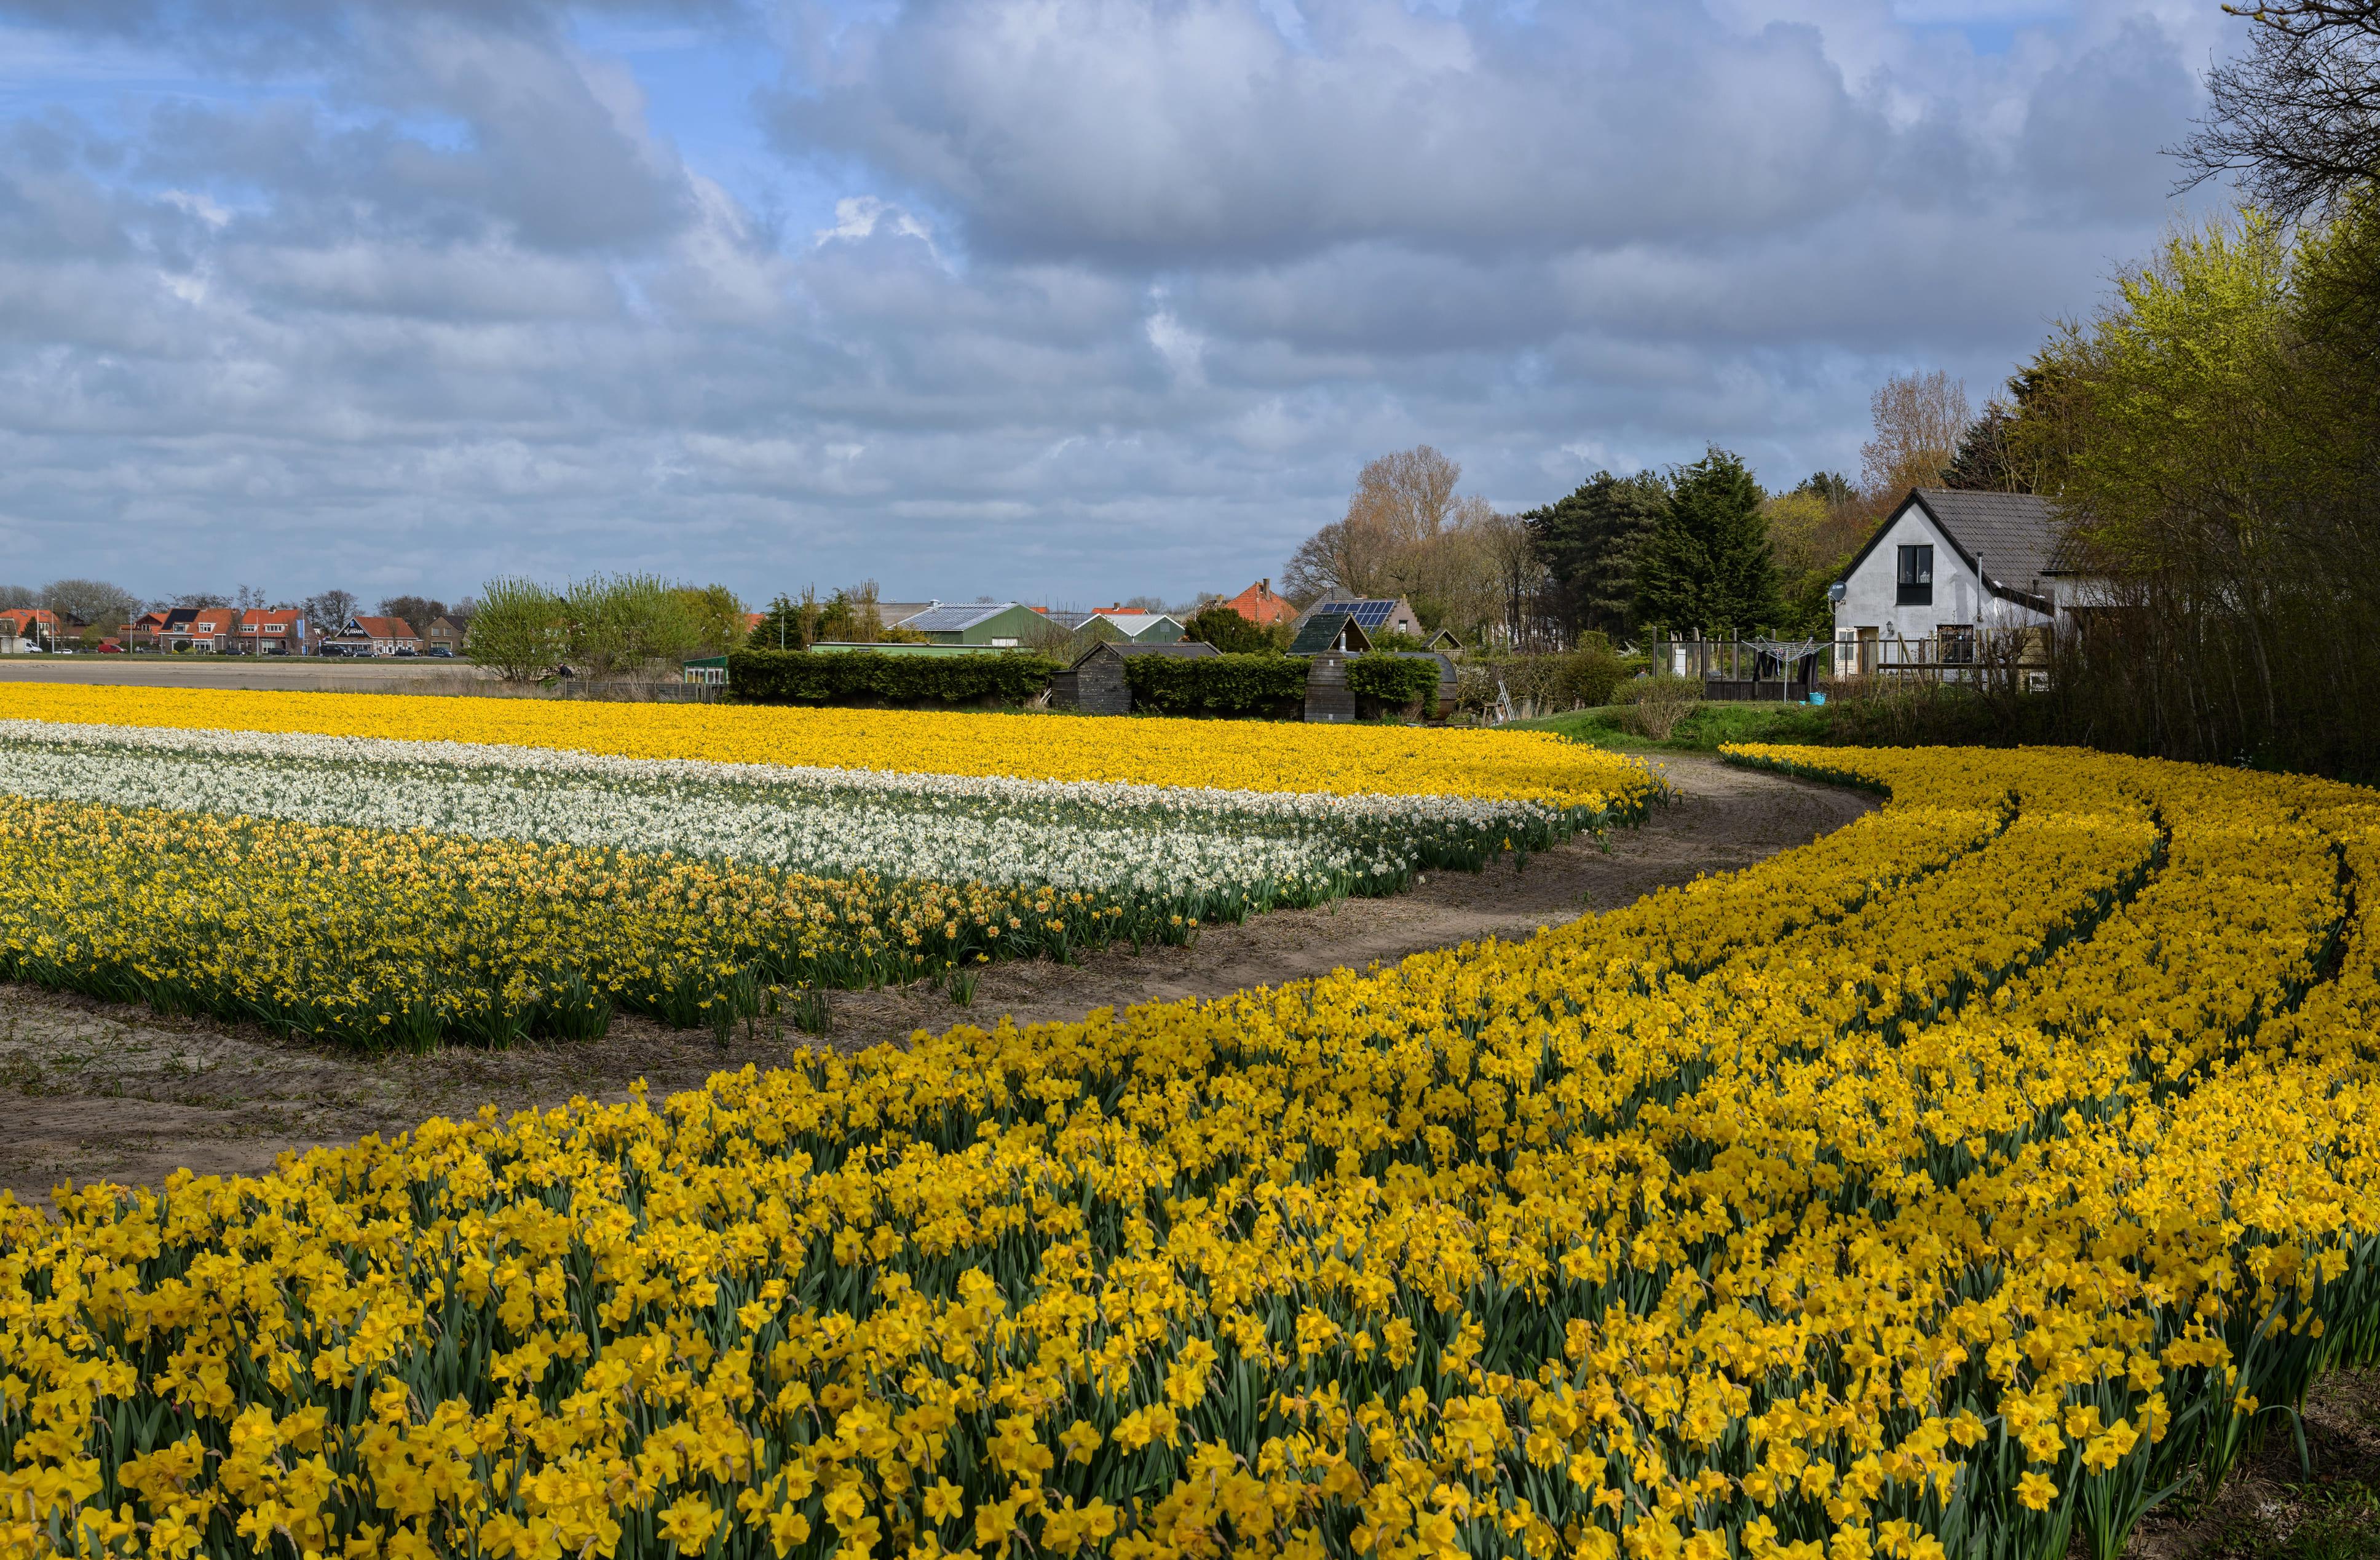 daffodils-photo-93